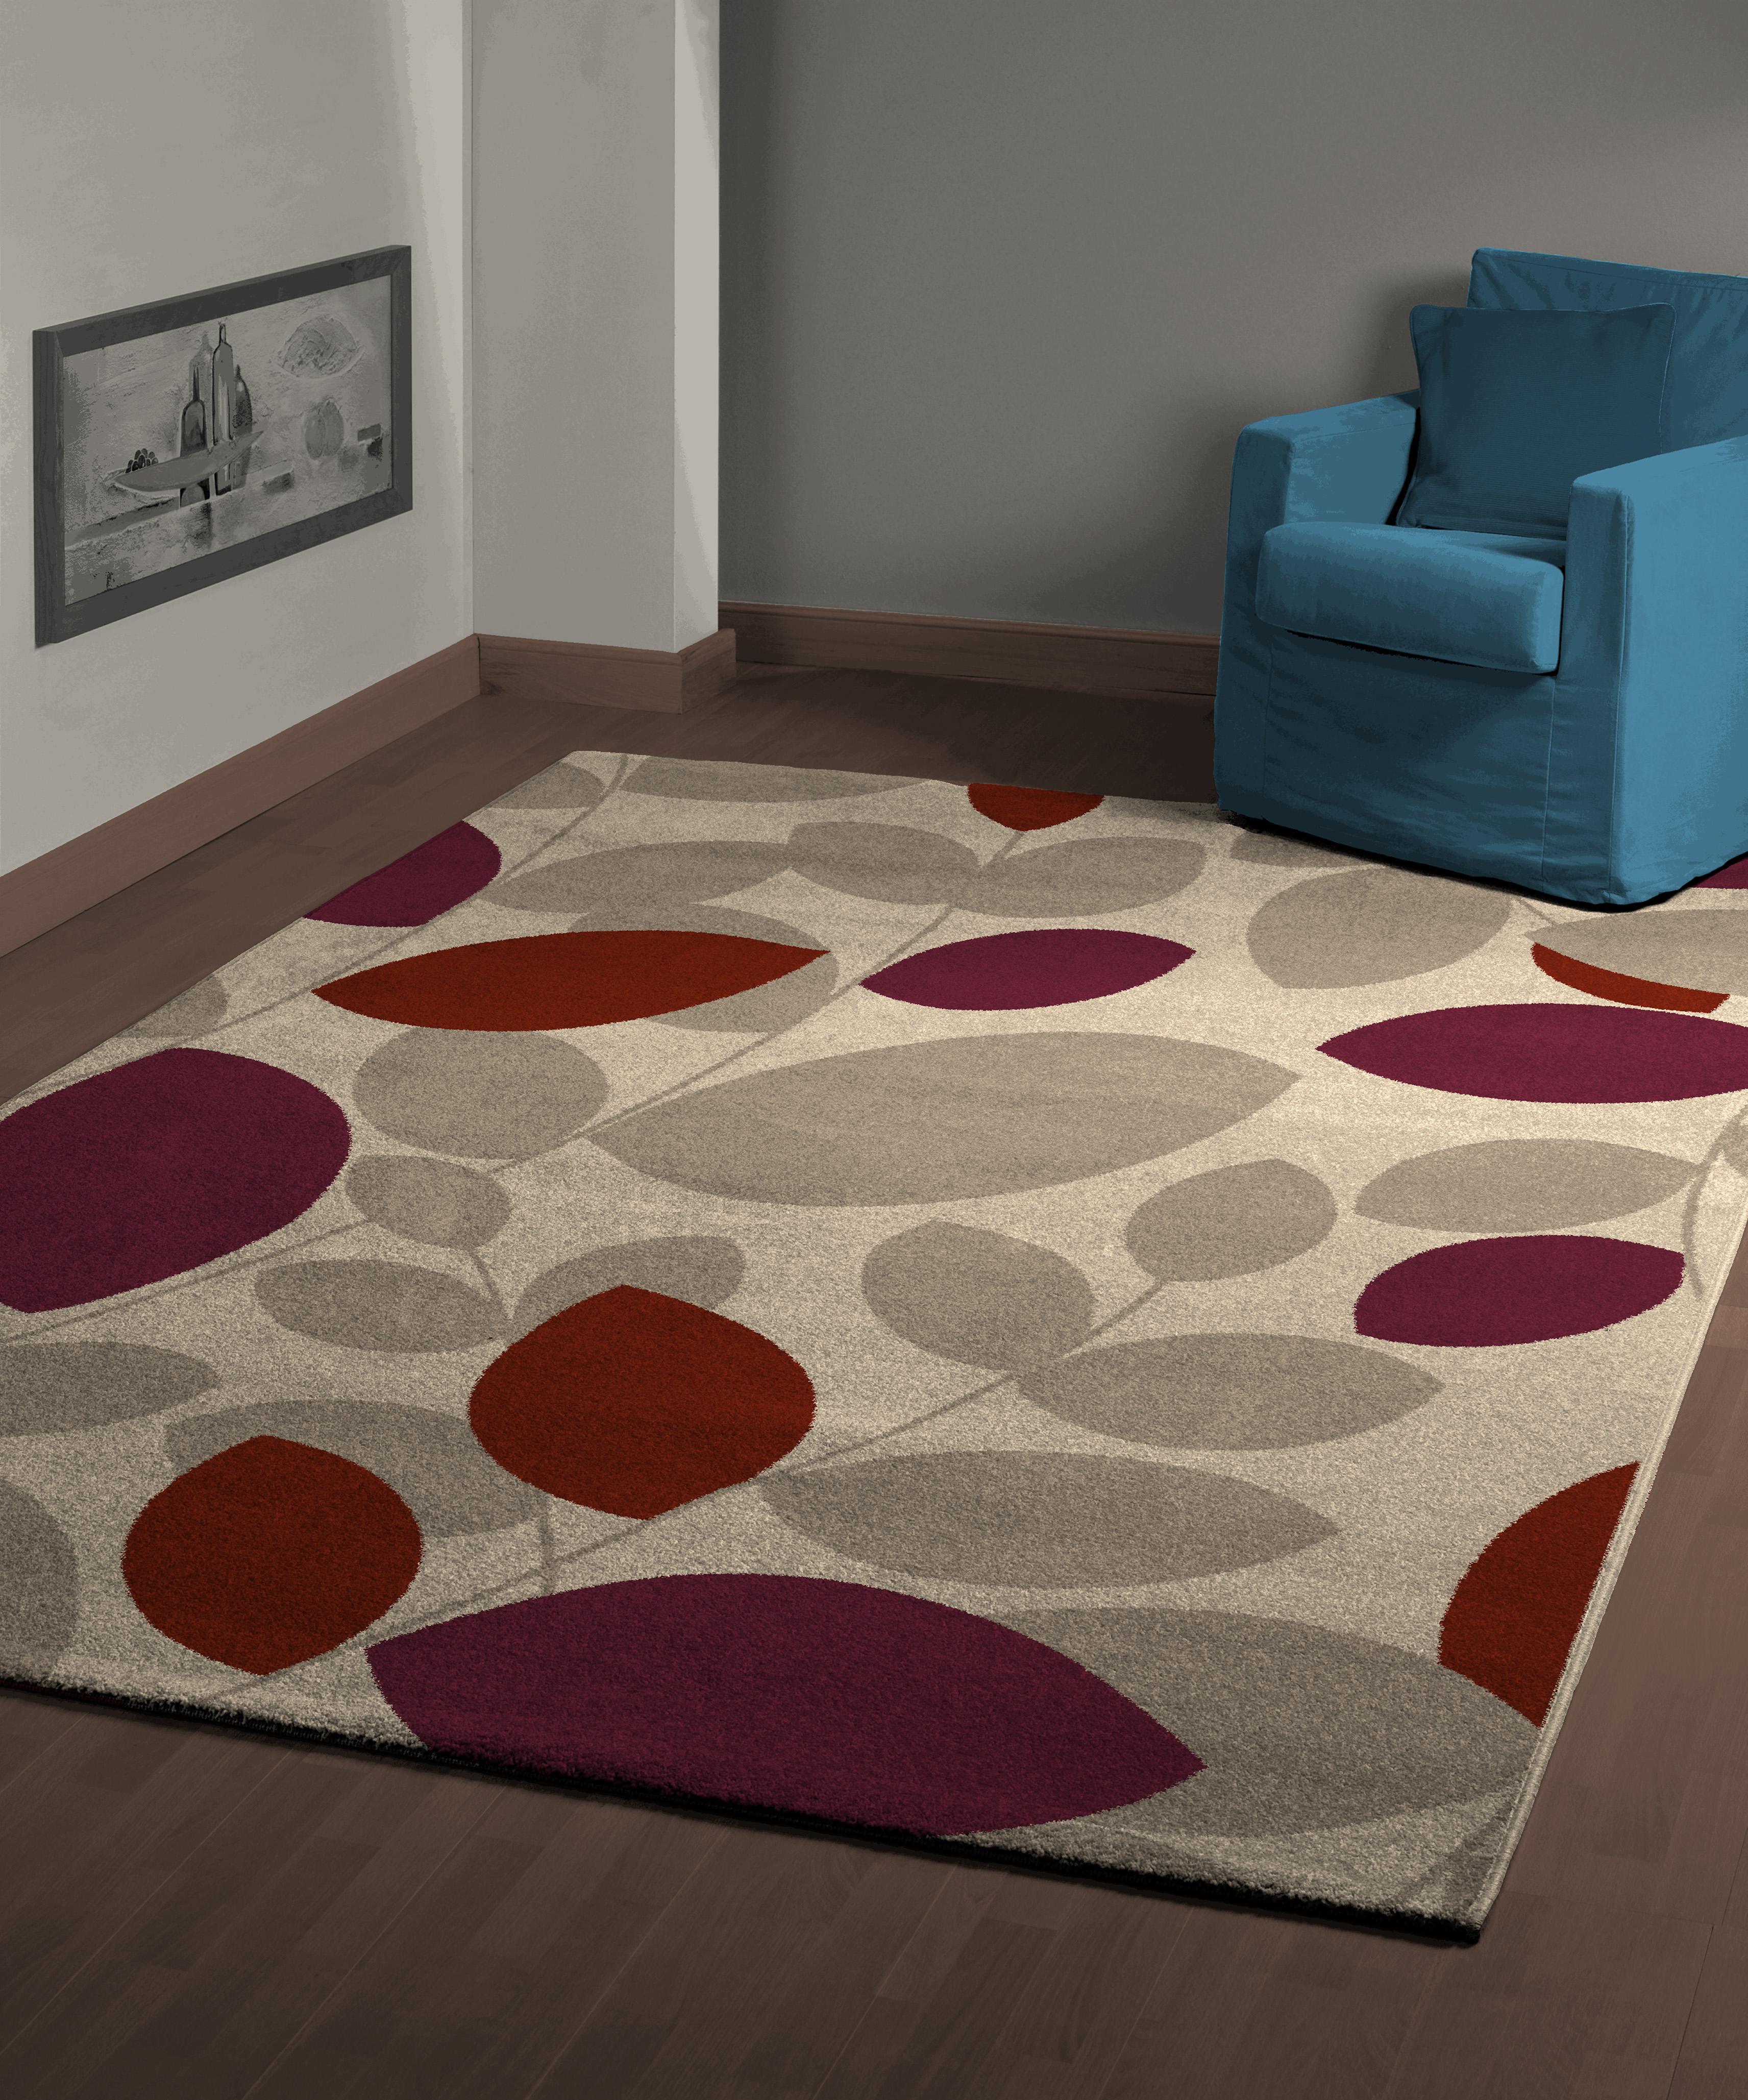 carpet design ideas brilliant furniture nice living room carpet decorating ideas to beautify  with for TPKFWUZ